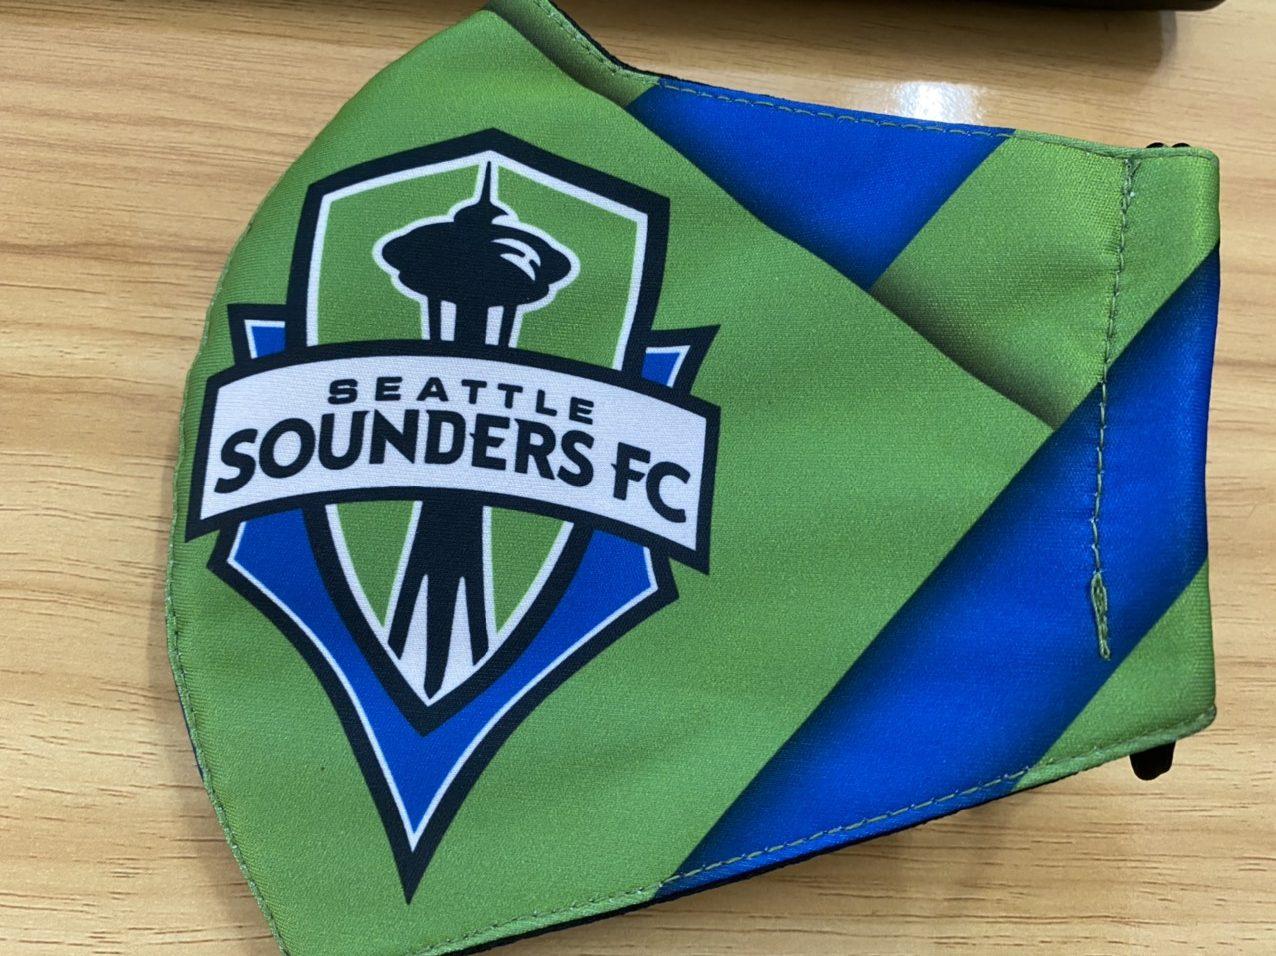 Khẩu Trang Vải In Logo SEATTLE SOUDERS FC 2 Lớp - Mẫu Khẩu Trang In 3D Logo Đội Bóng SEATTLE SOUNDERS FC Nền Xanh 6